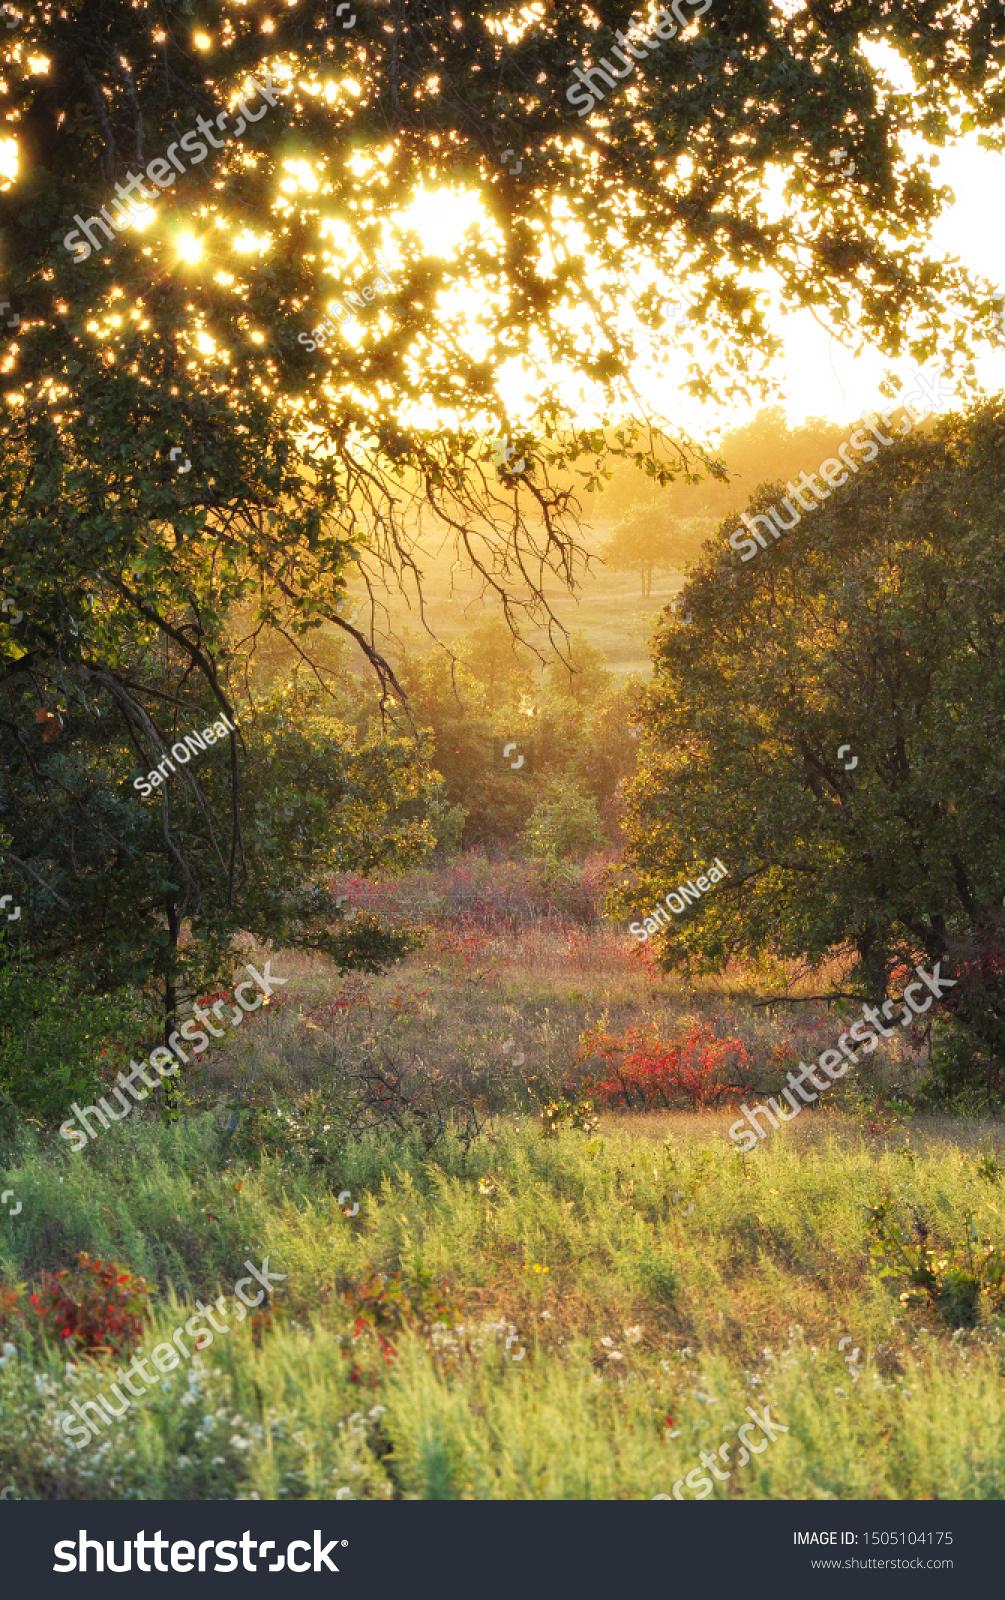 stock-photo-autumn-meadow-in-late-evenin